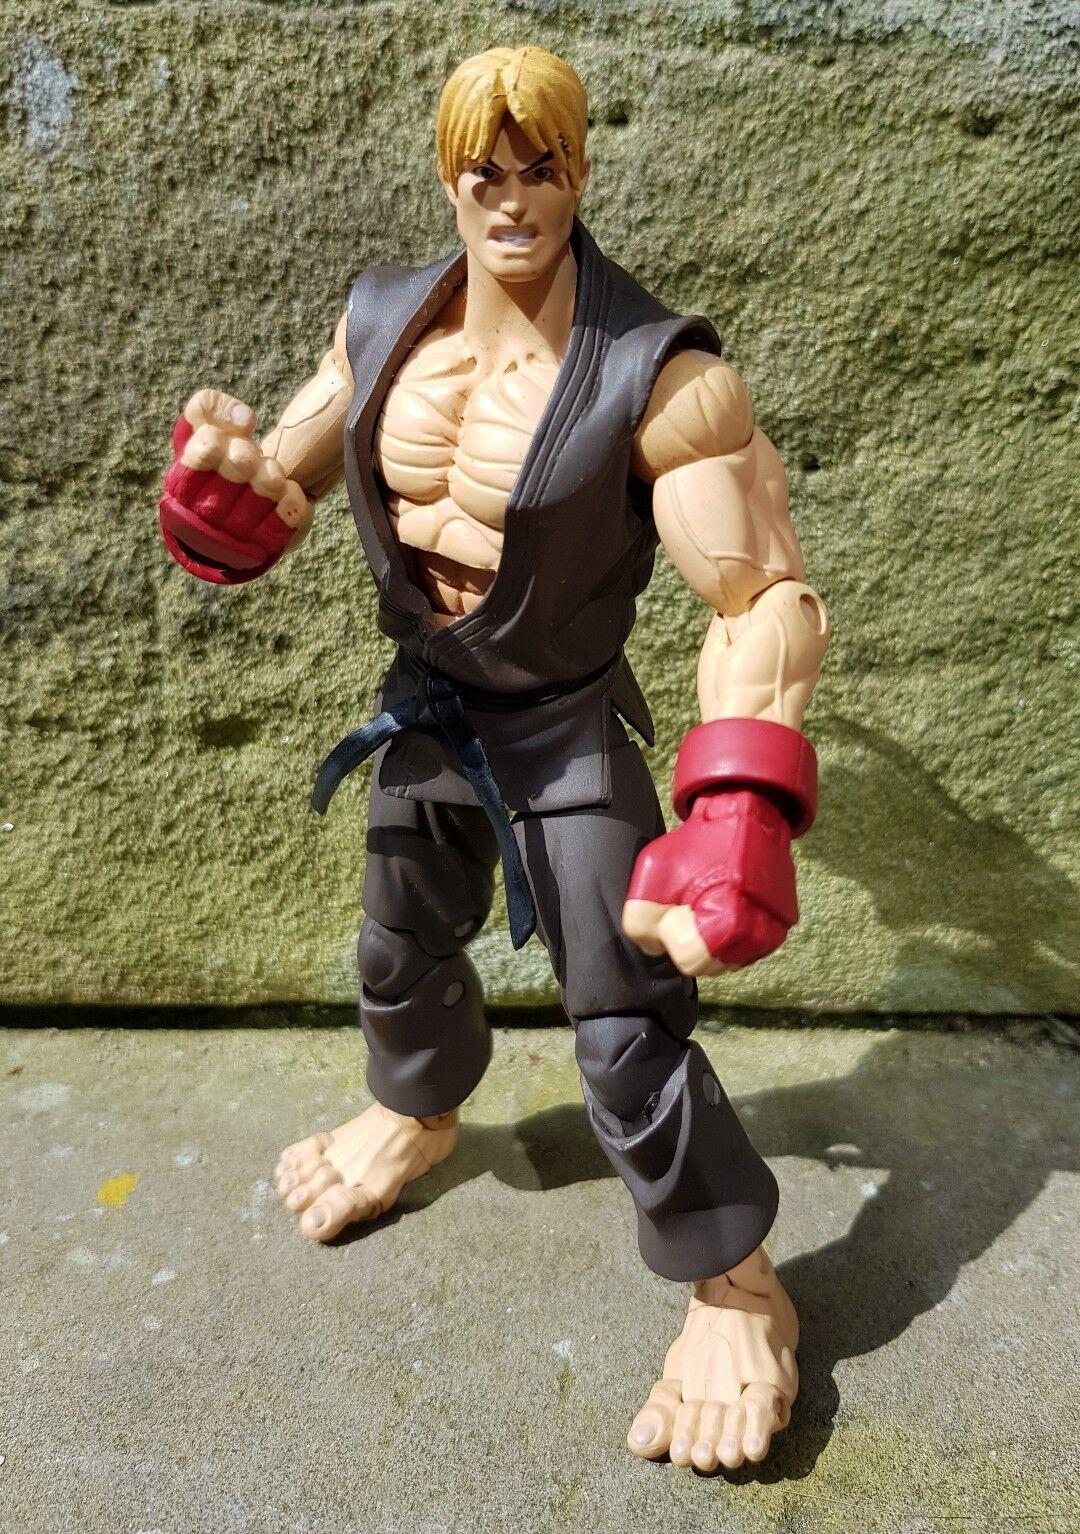 SOTA Toys - Player 2 braun Ken Street Fighter 2 Rare